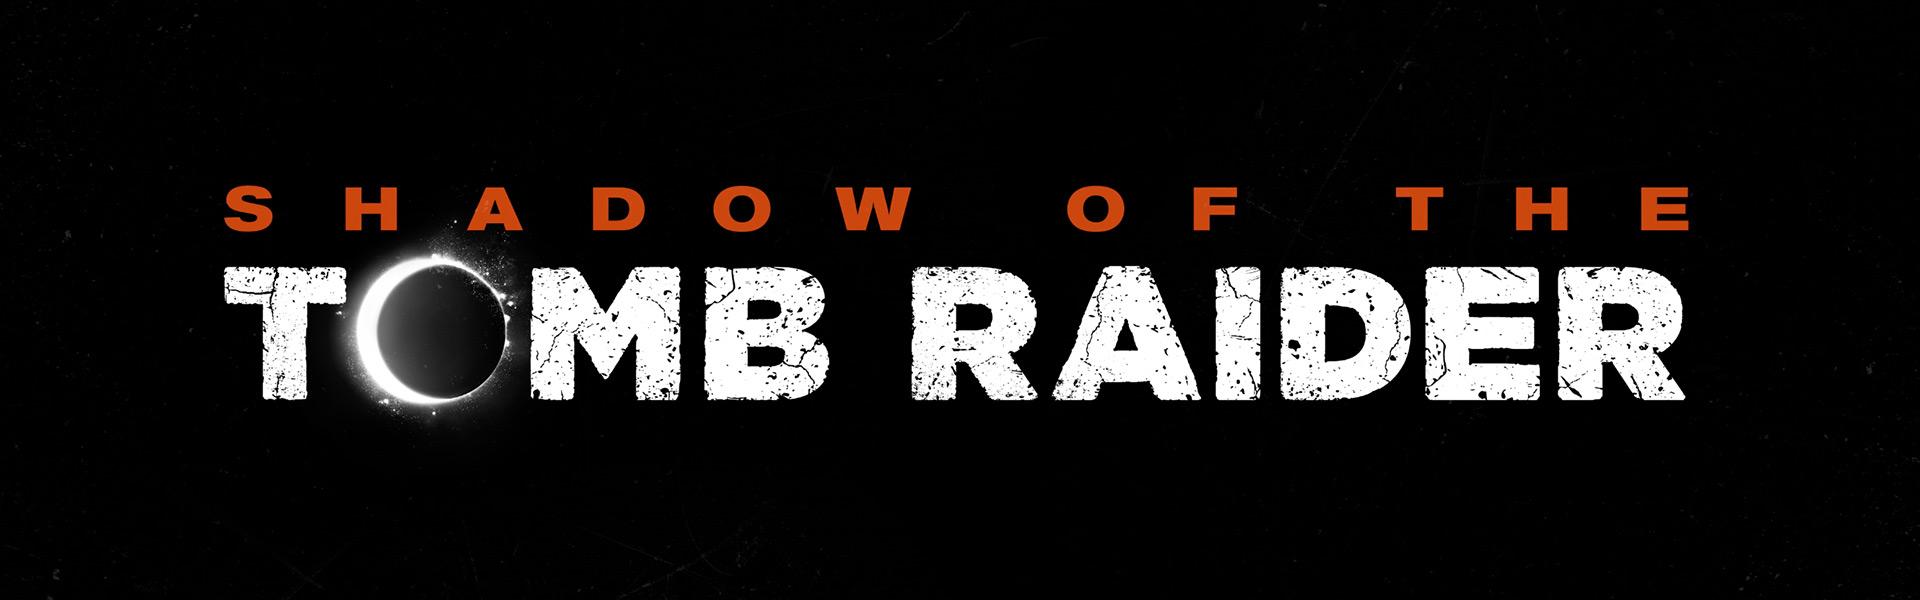 Shadow of the Tomb Raider logo